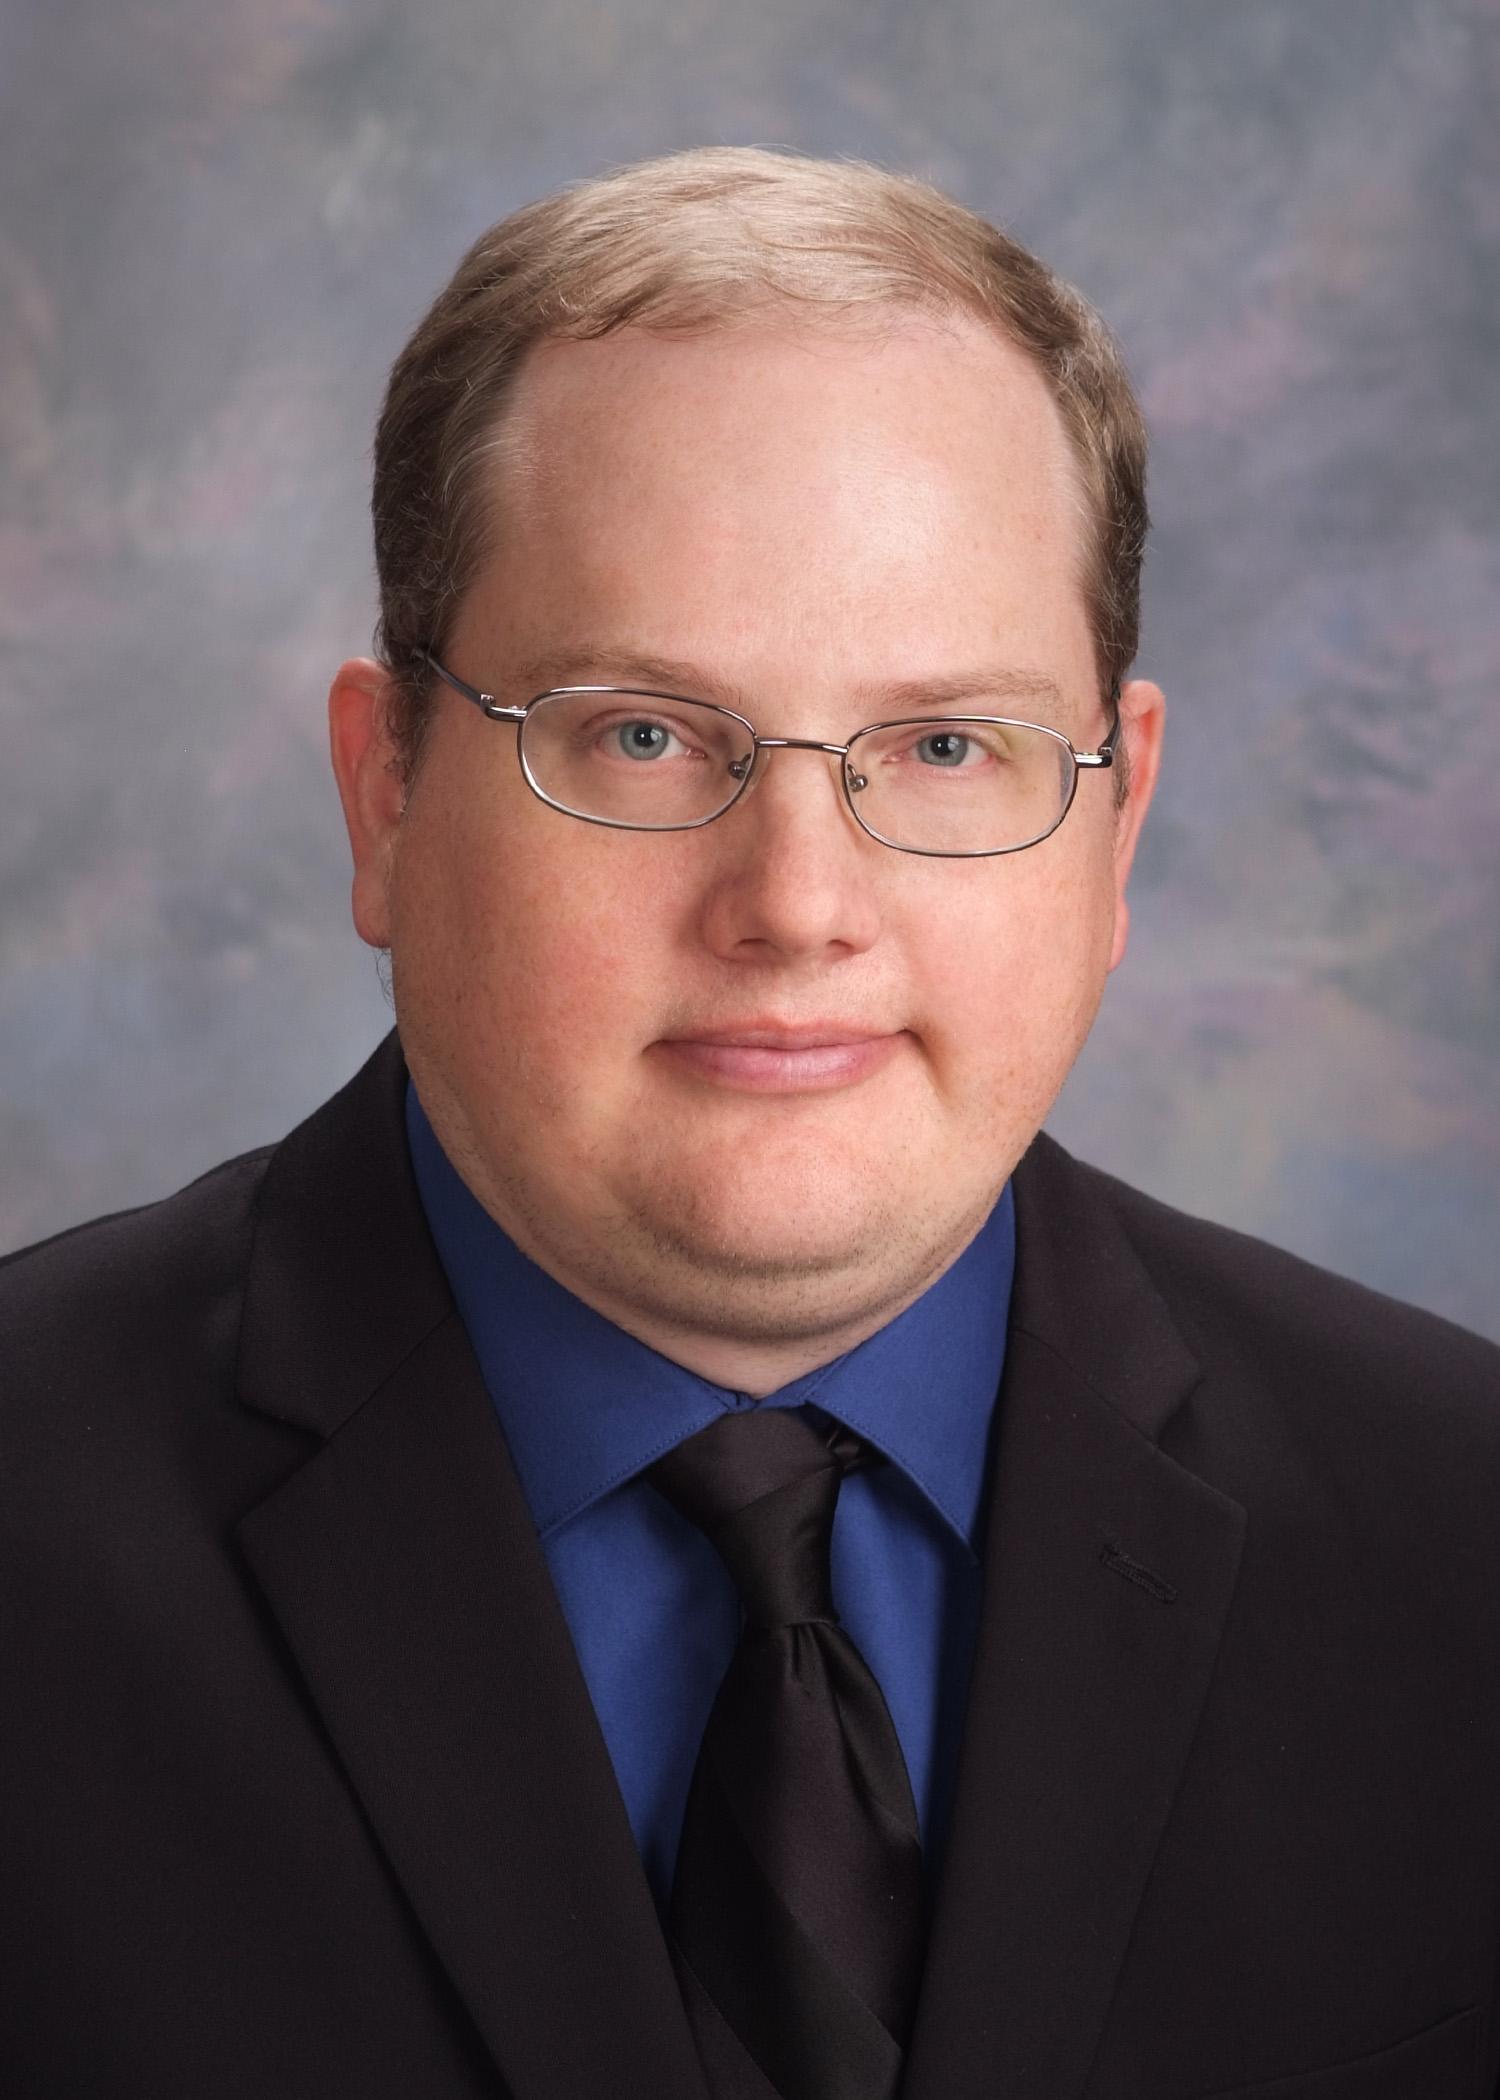 Michael Lorenzen